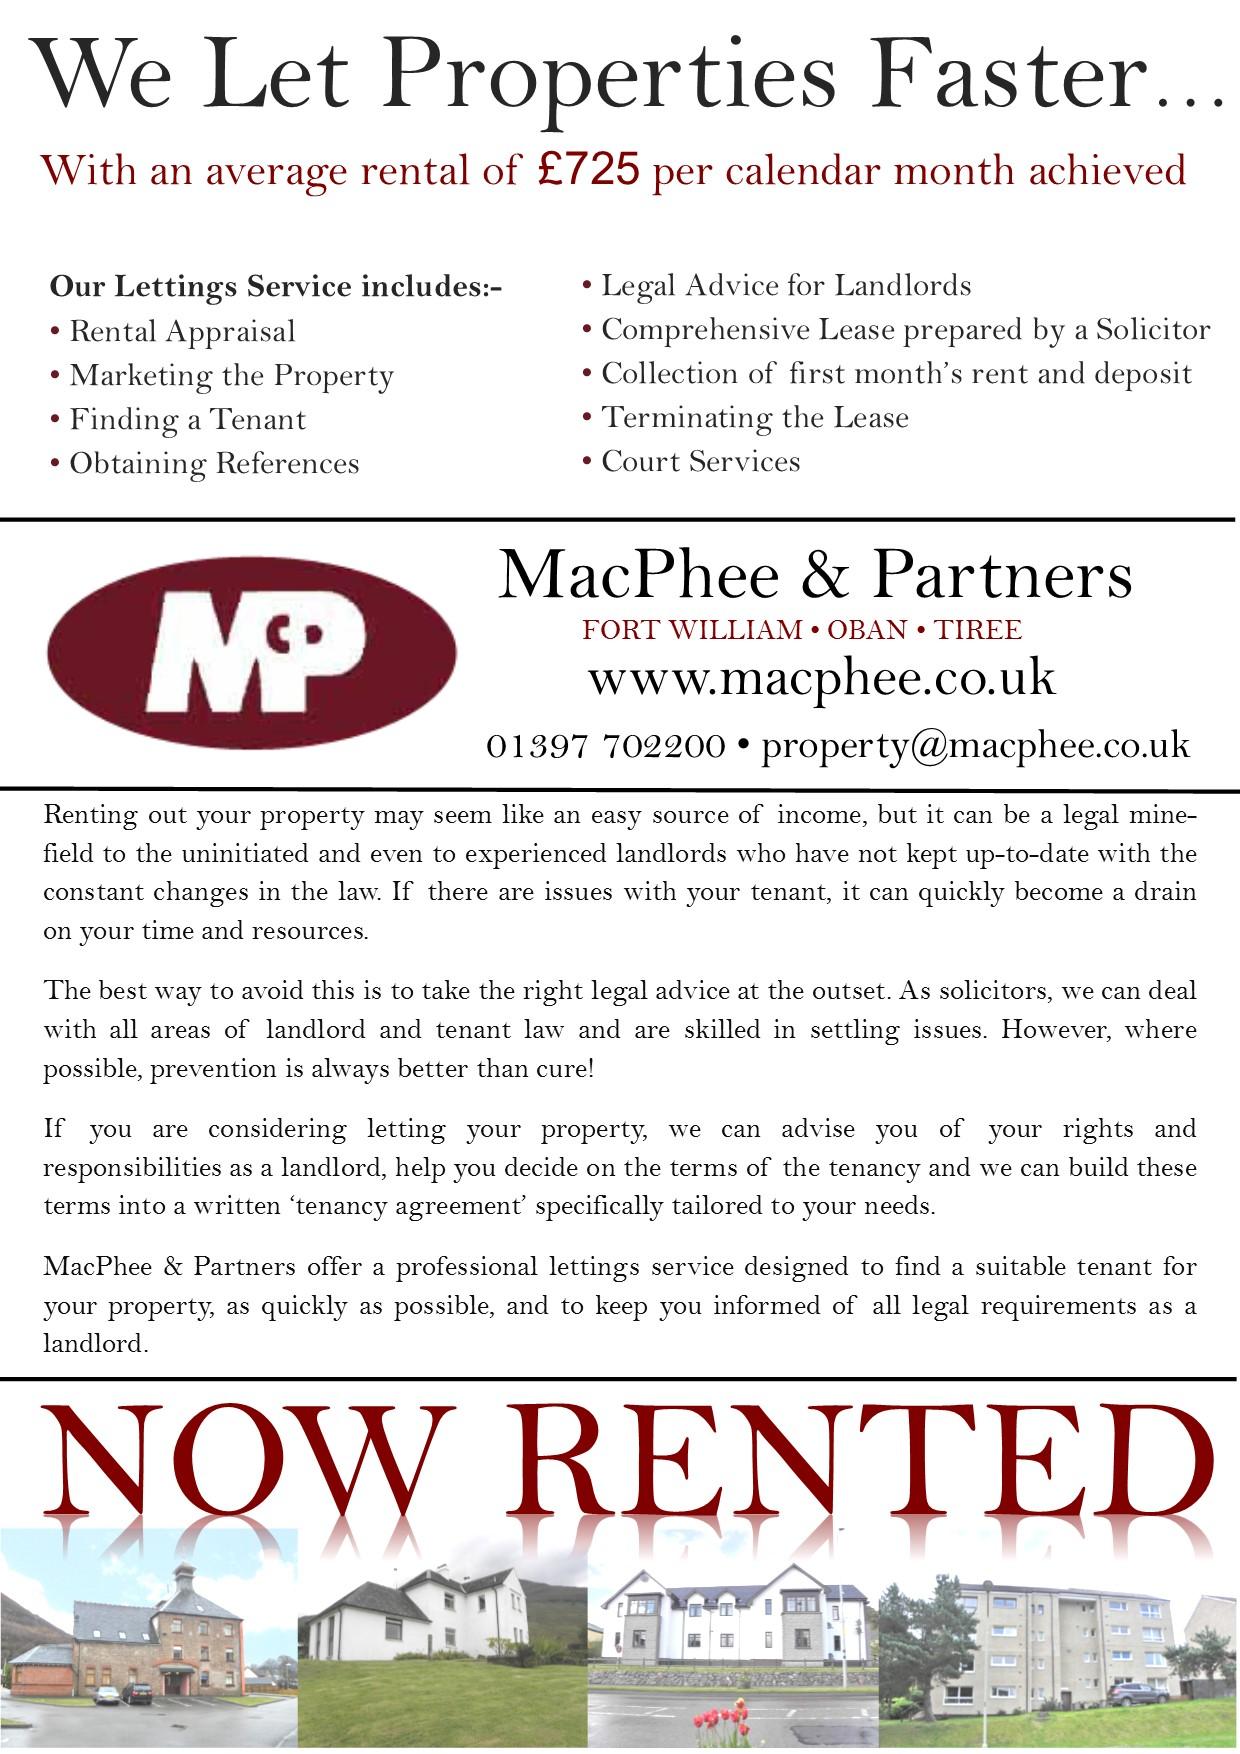 LL Rental - MacPhee (j-peg)